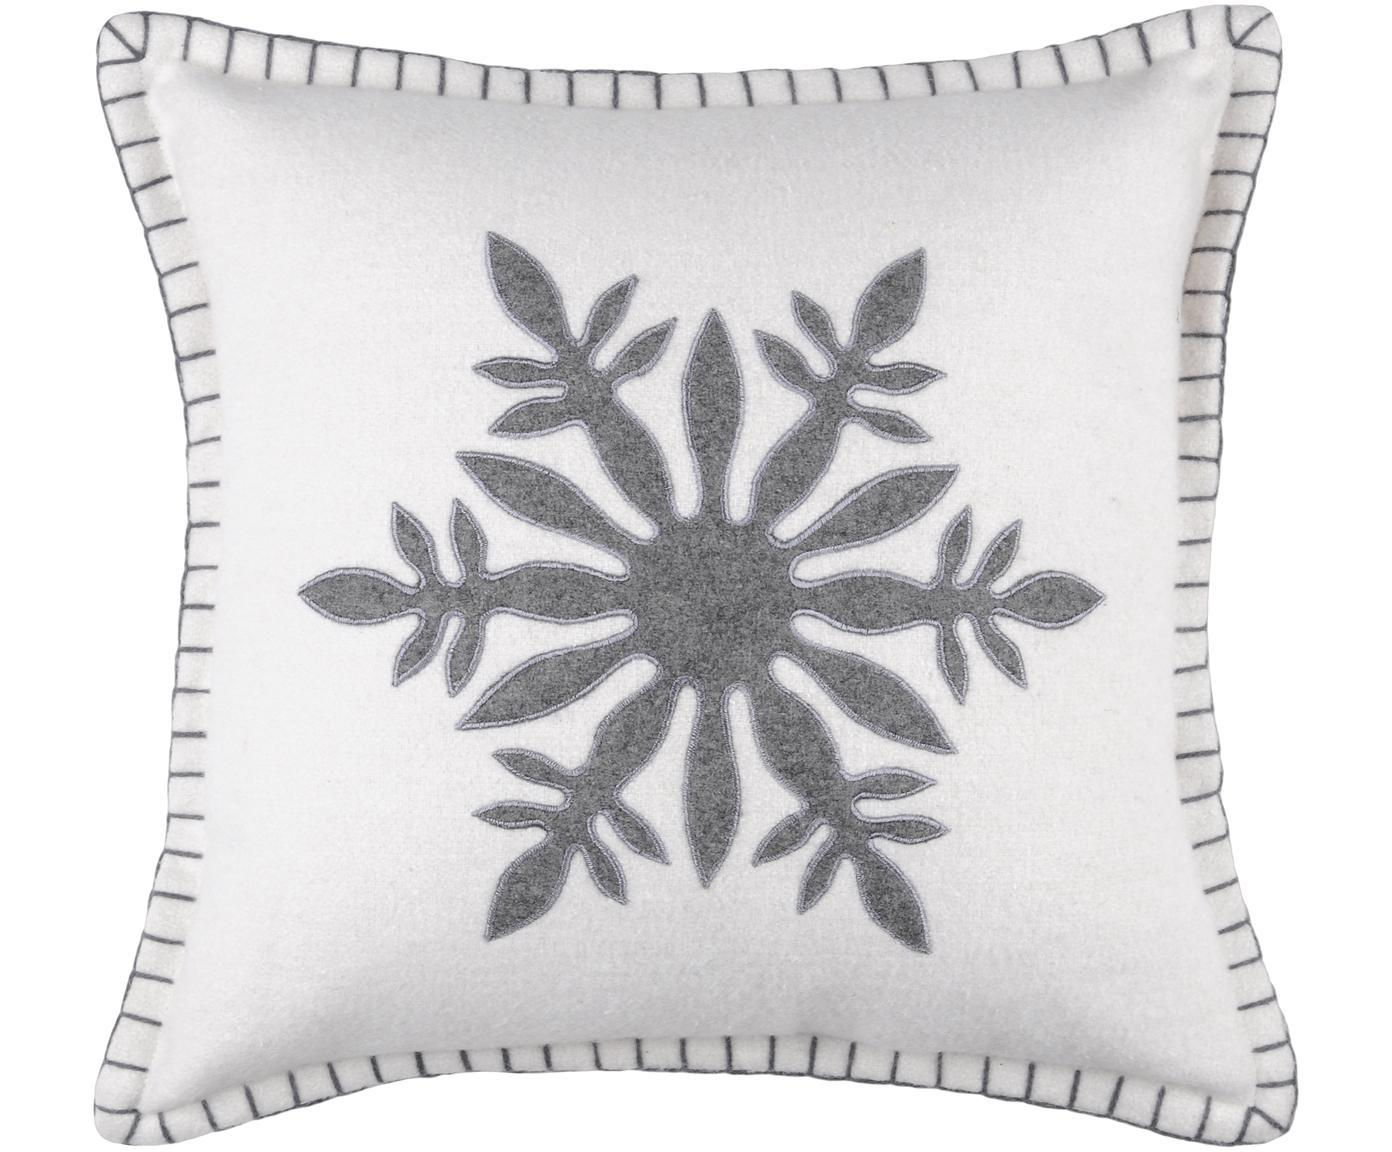 Cojín Vaujany, con relleno, Funda: 50%algodón, 32%lana, 7%, Blanco crudo, gris, An 40 x L 40 cm